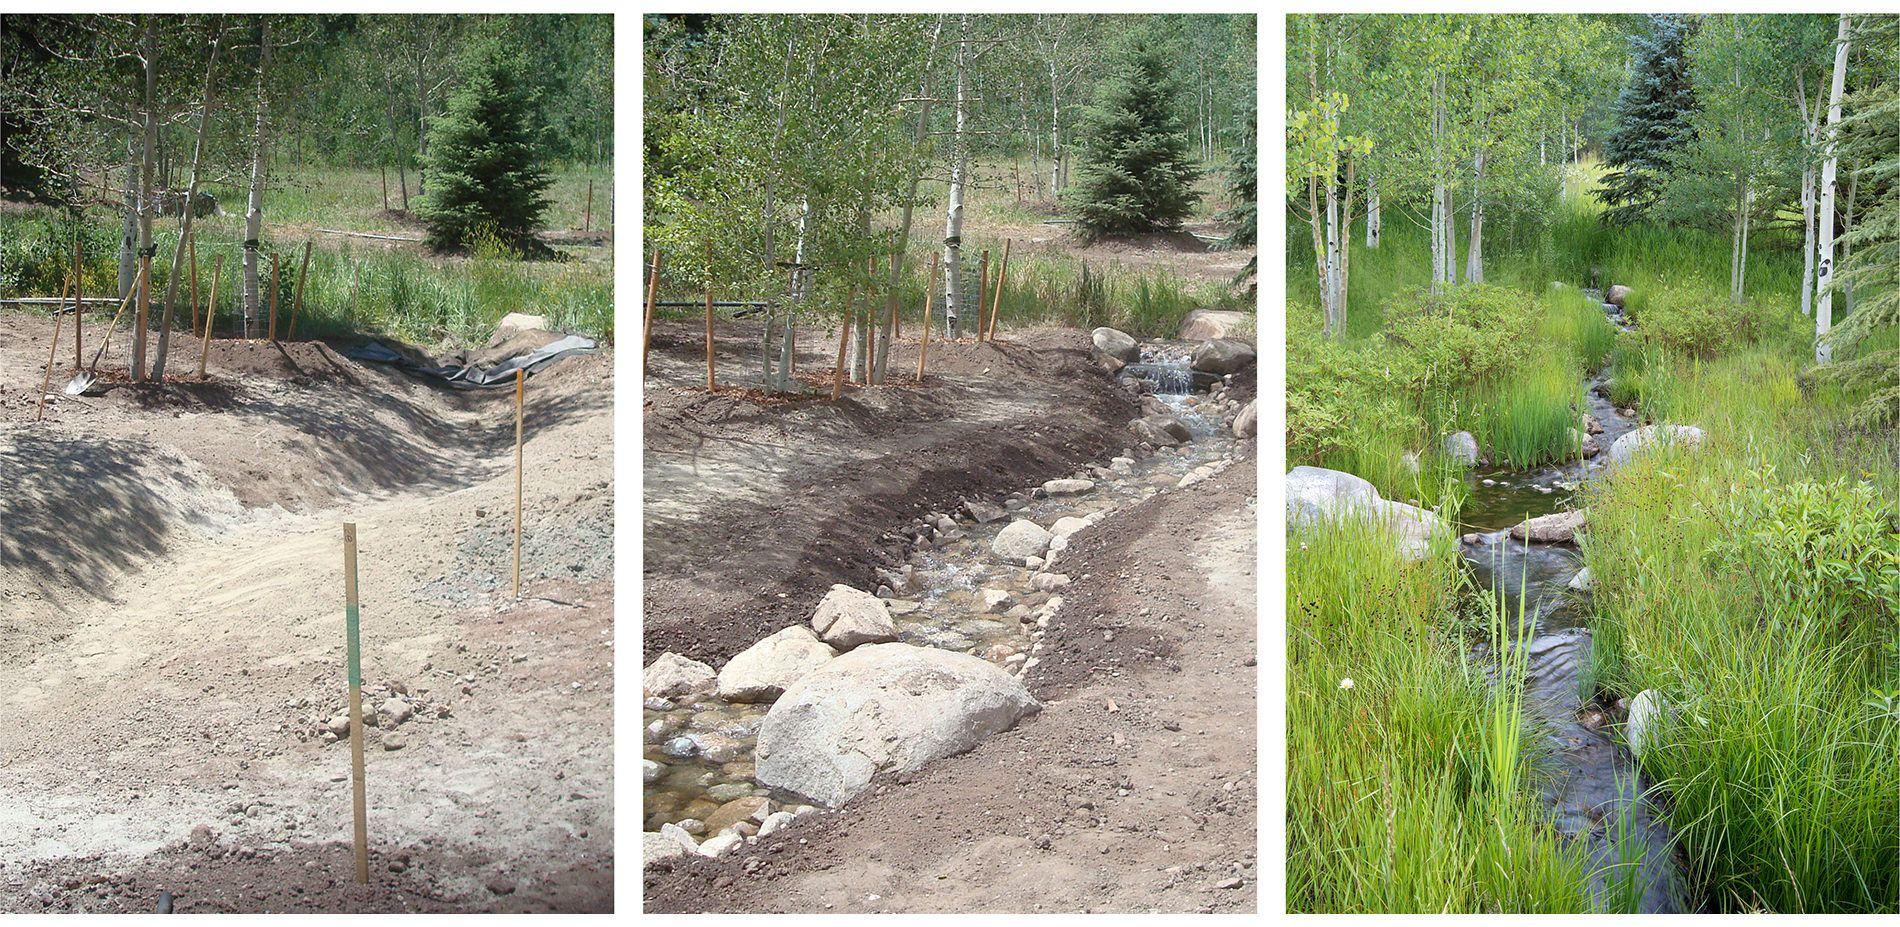 Naturalized Riparian Zone Before During And After Development Landscape Landscape Architecture Landscape Architect